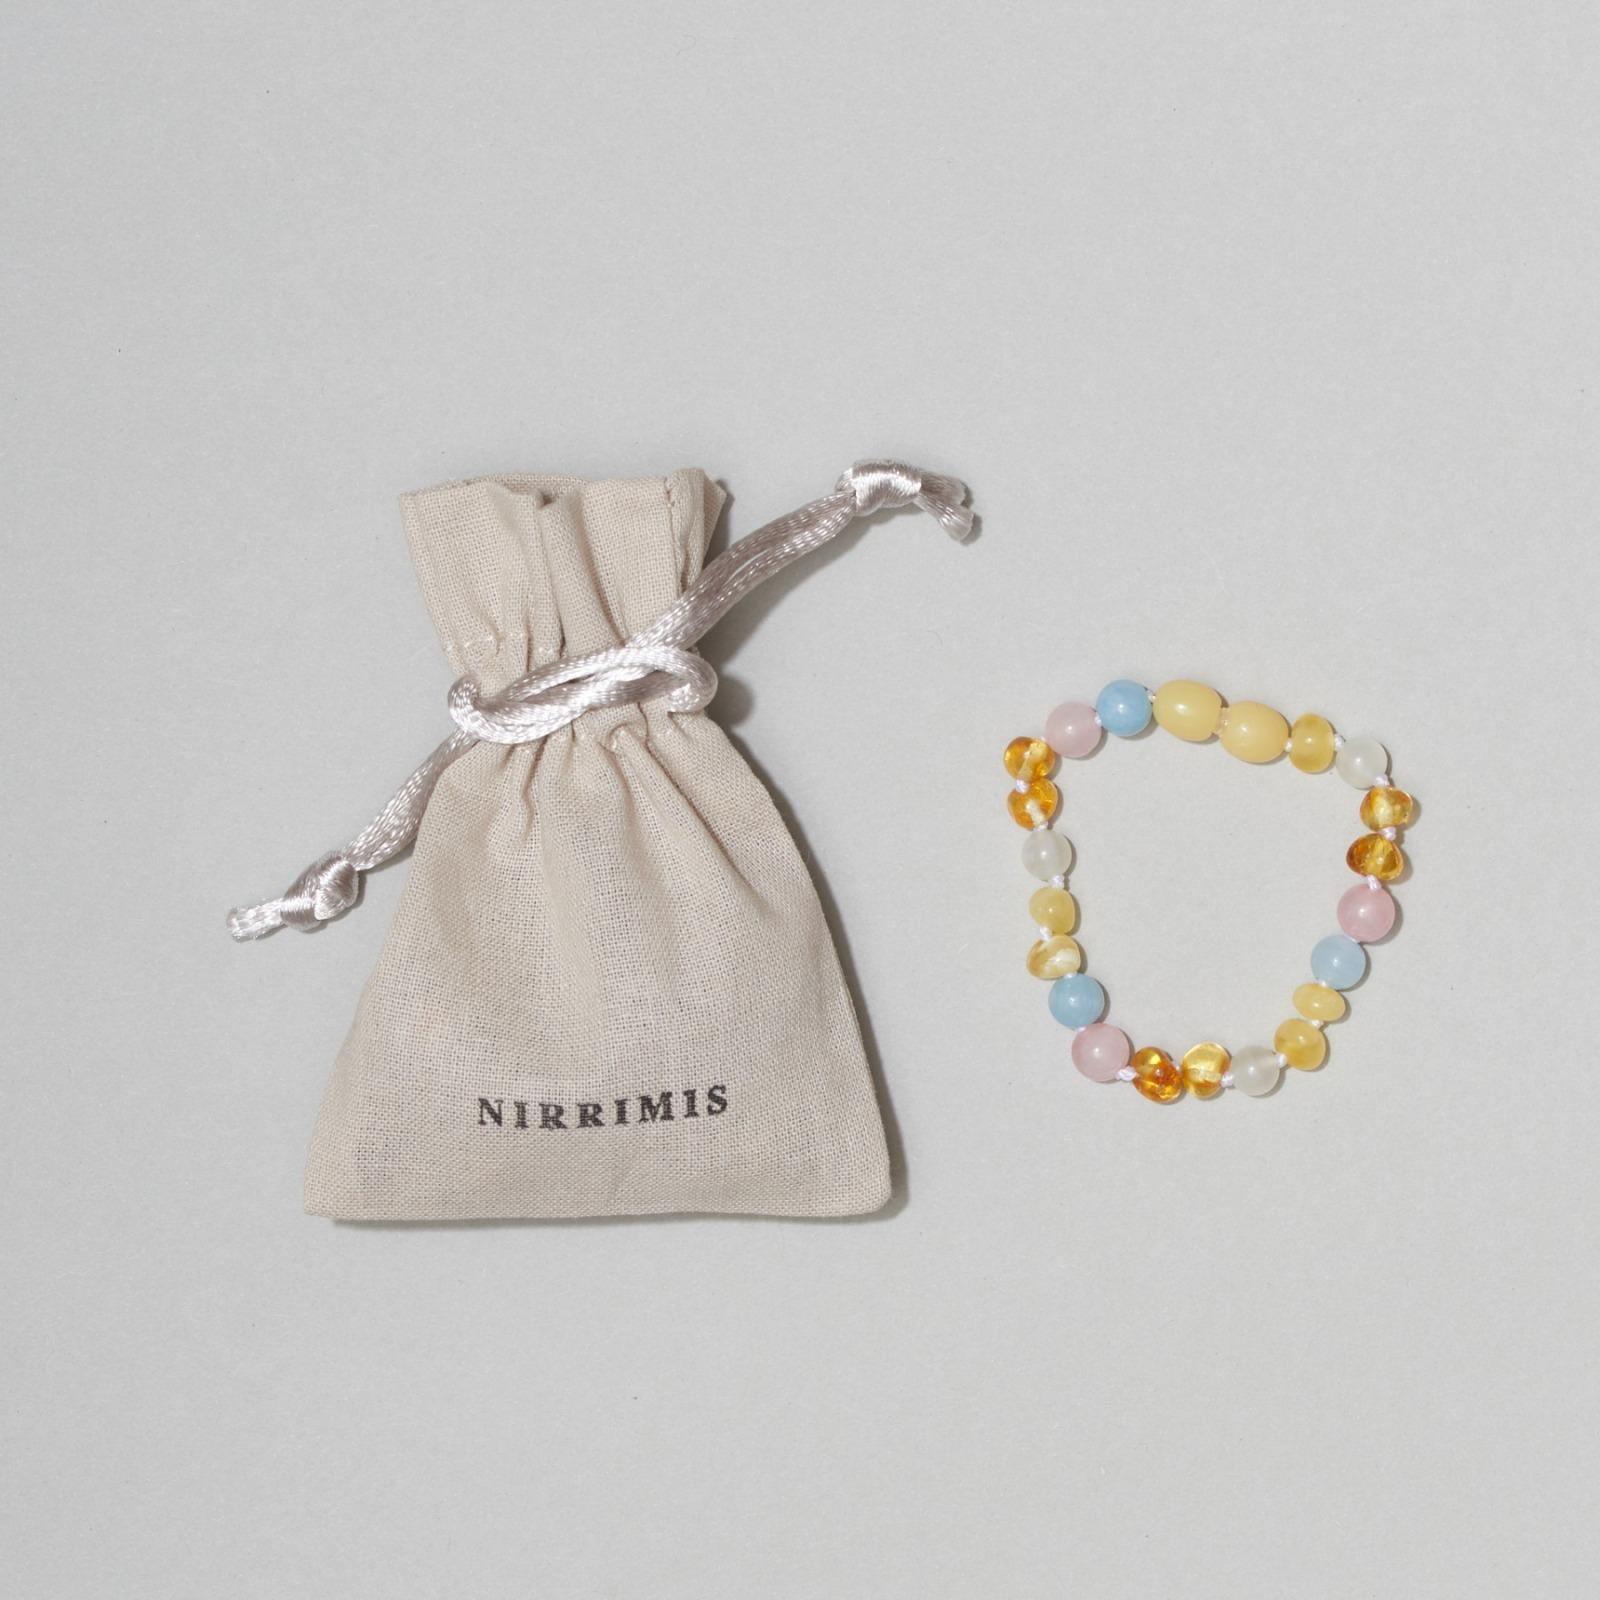 Nirrimis Armband Lily